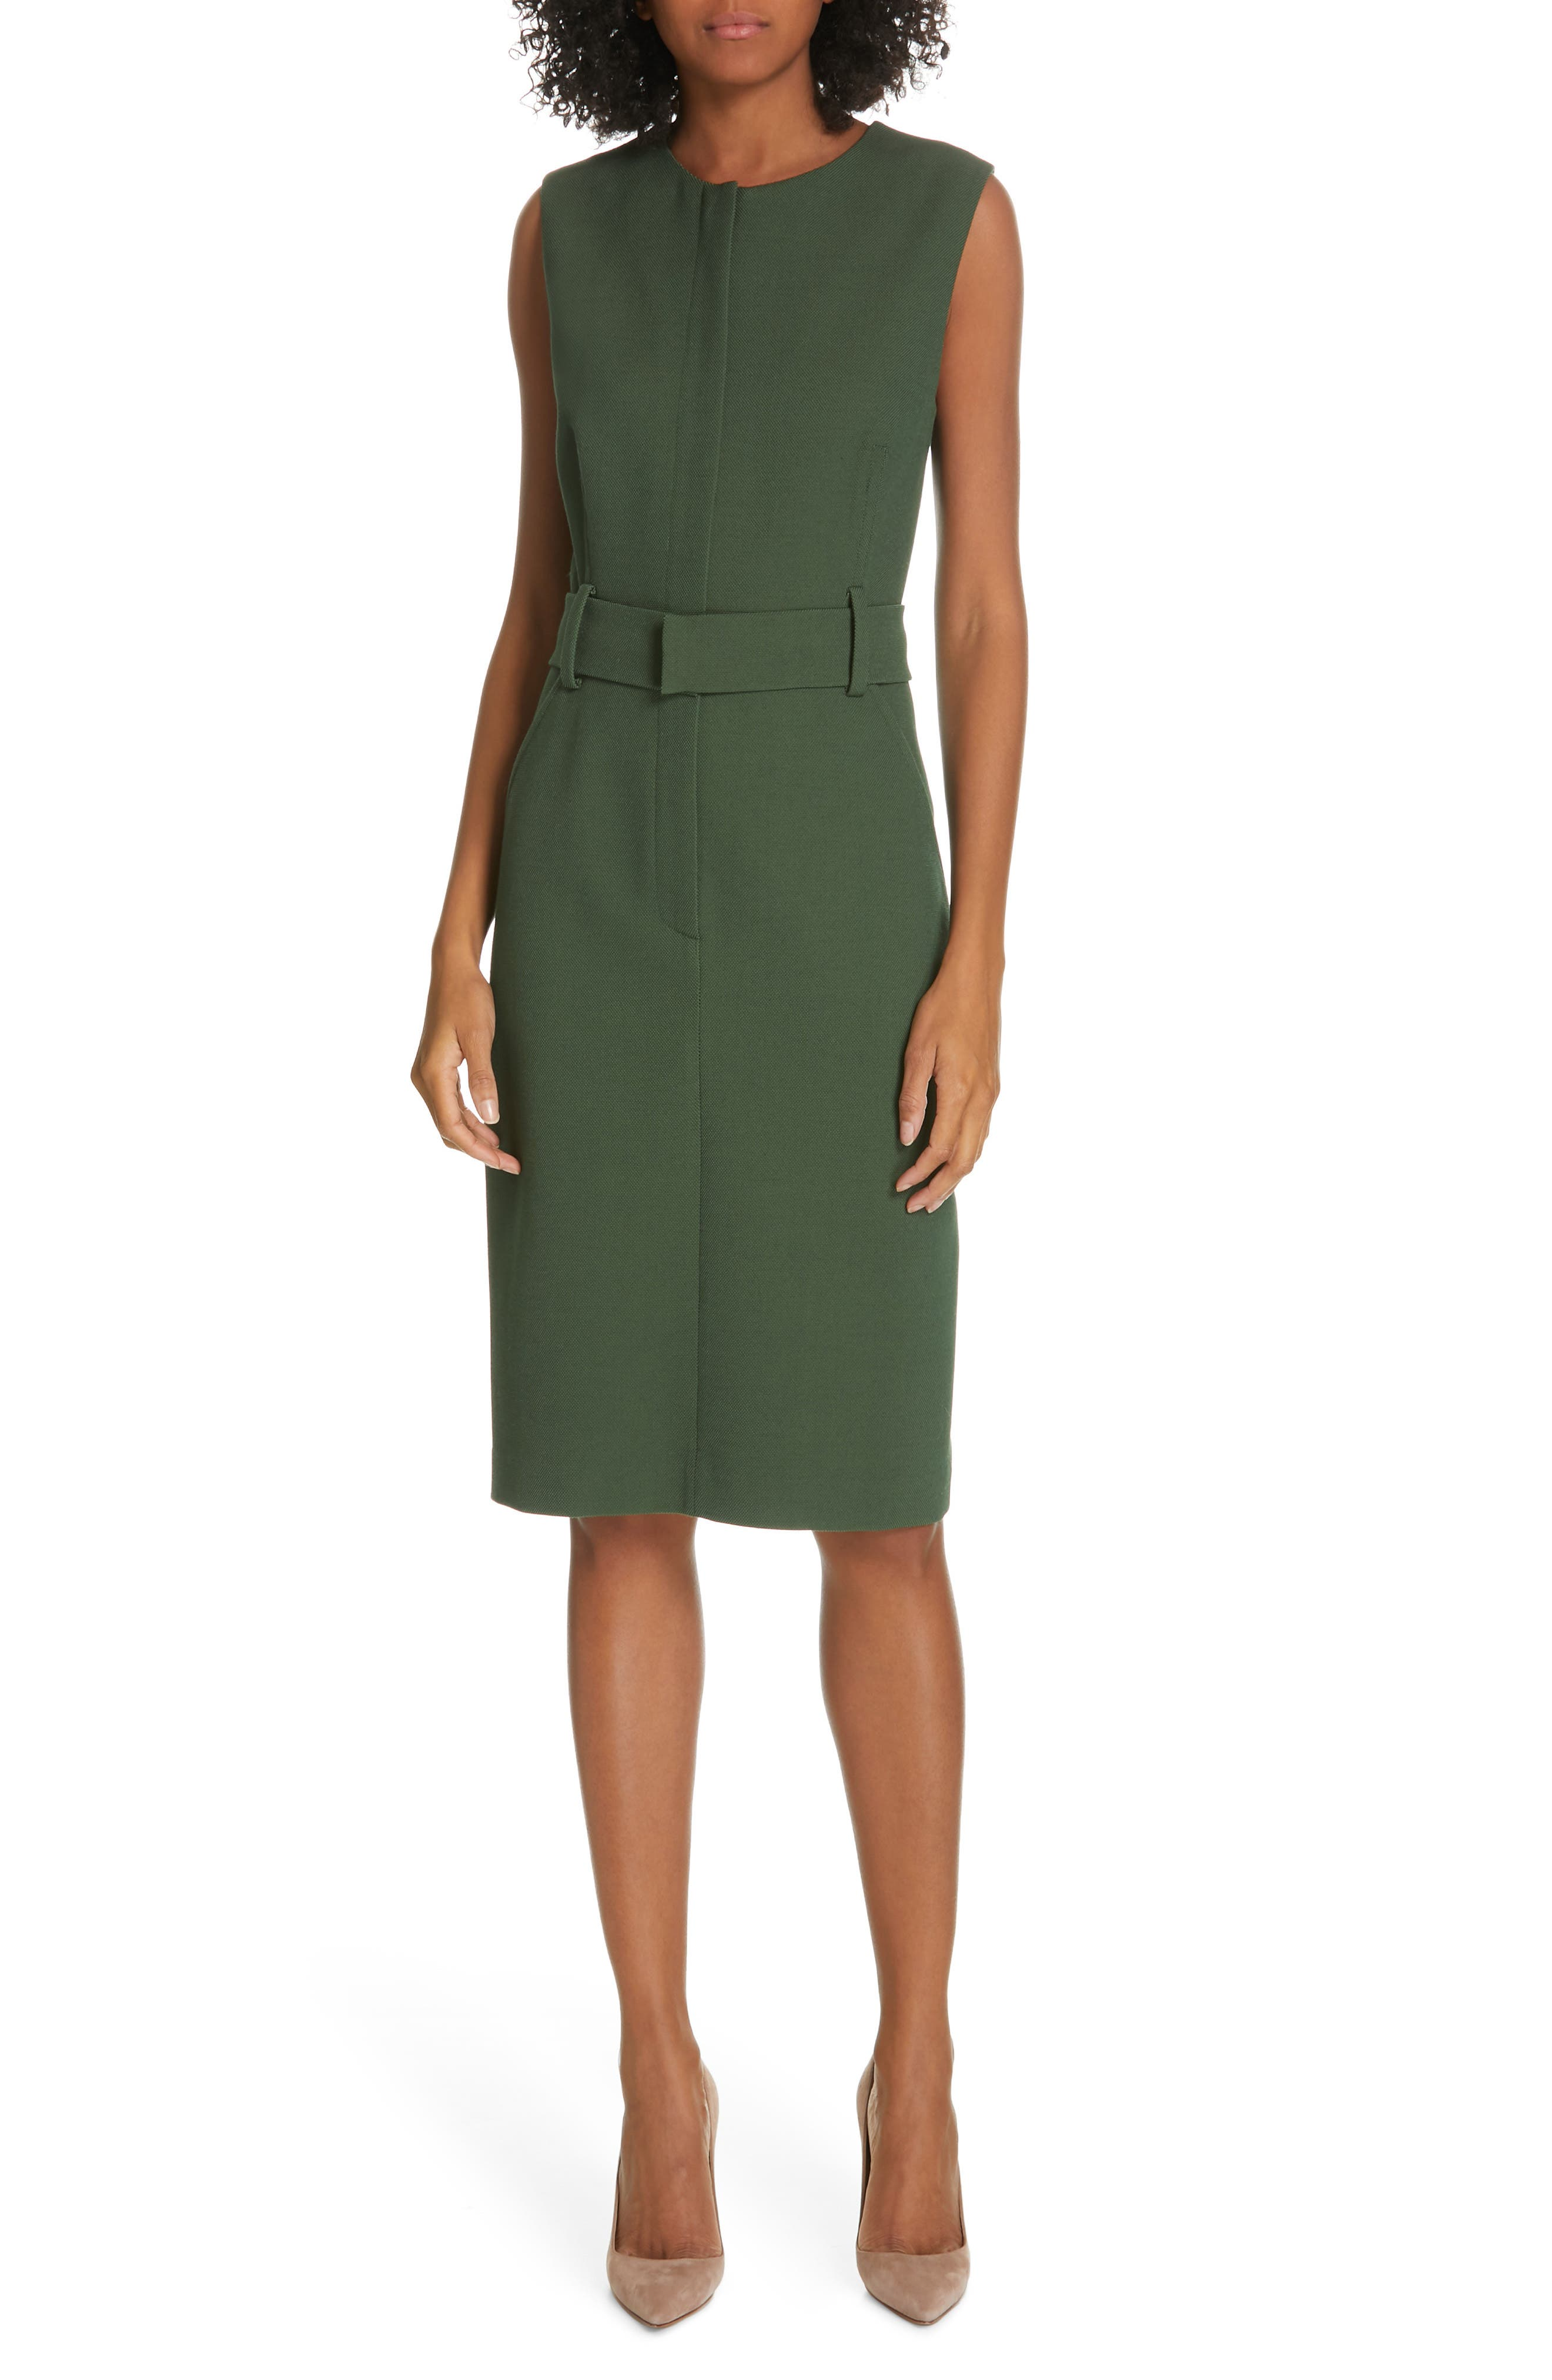 Judith & Charles Edge Belted Dress, Green